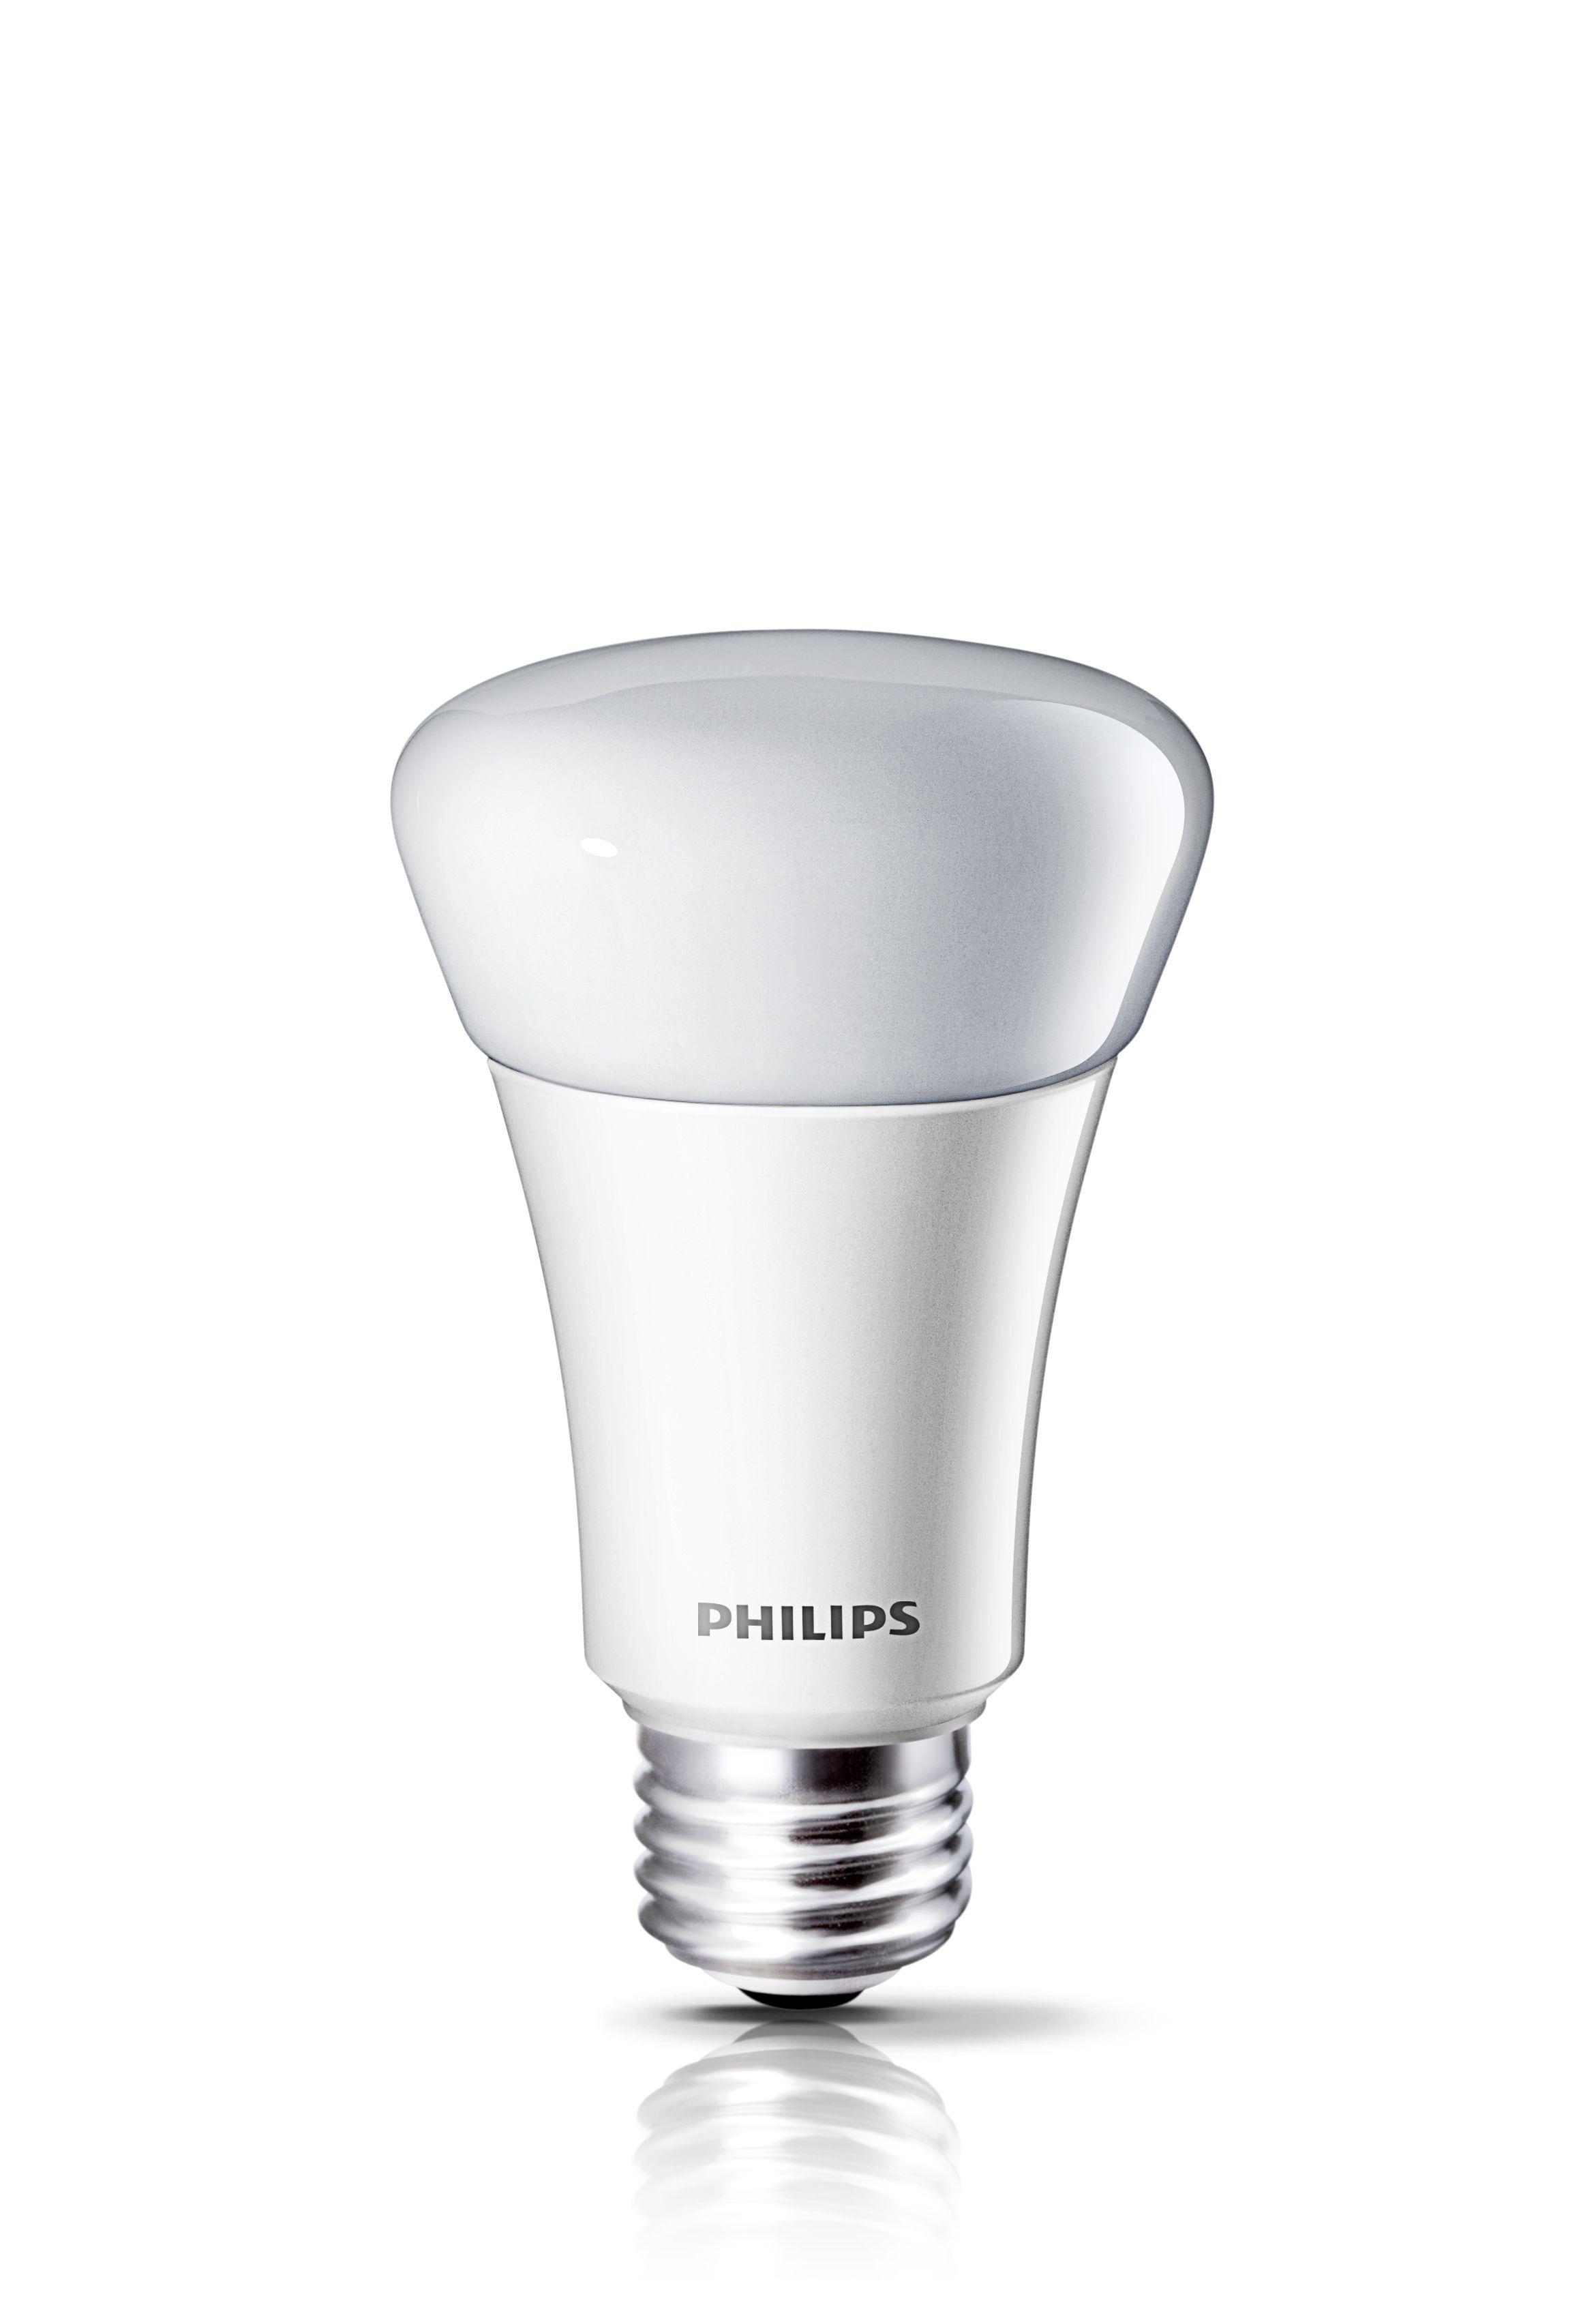 light mazda led philips vision interior bulbs lighting lights bulb